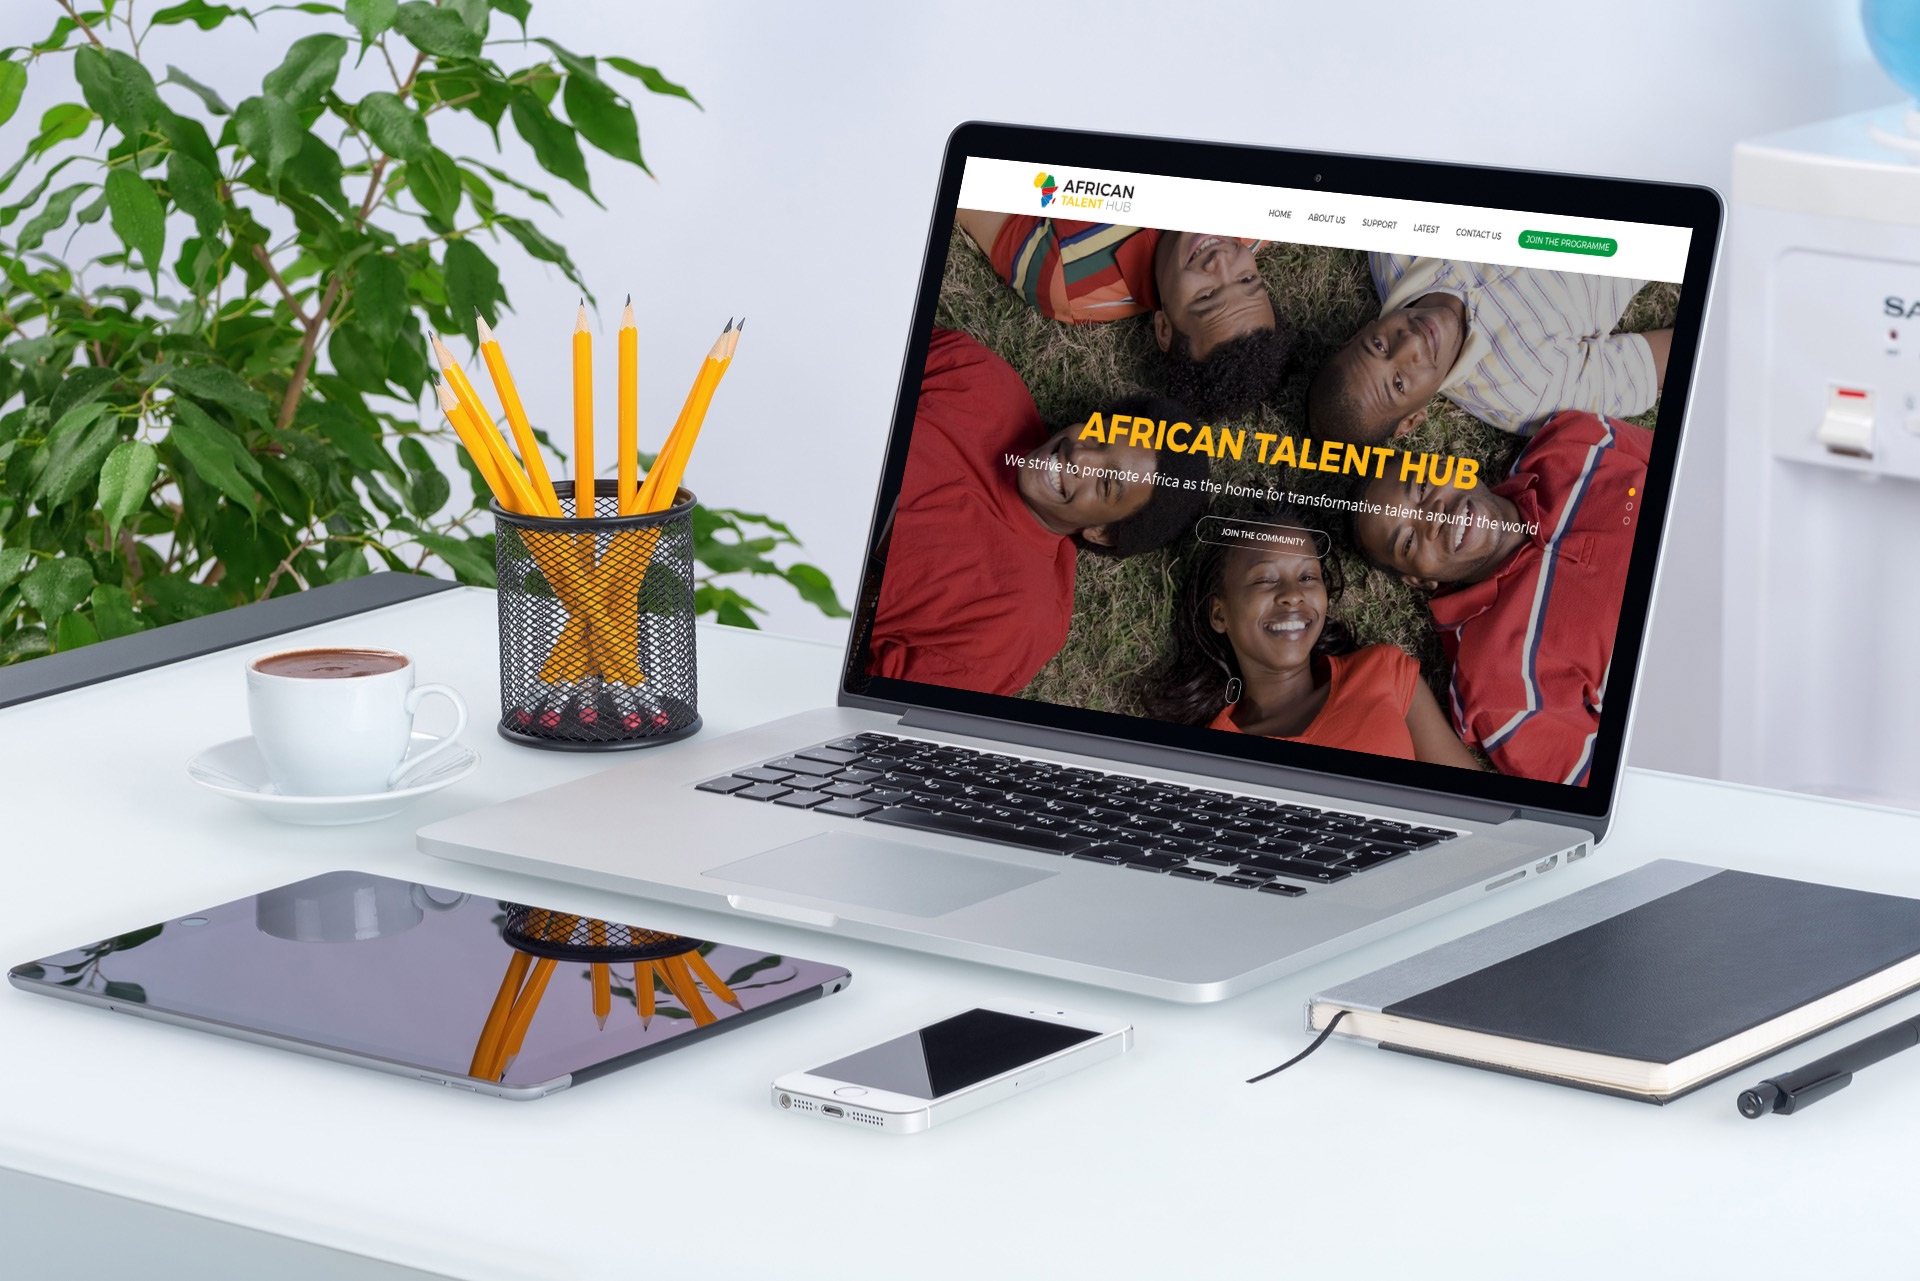 African-talent-hub